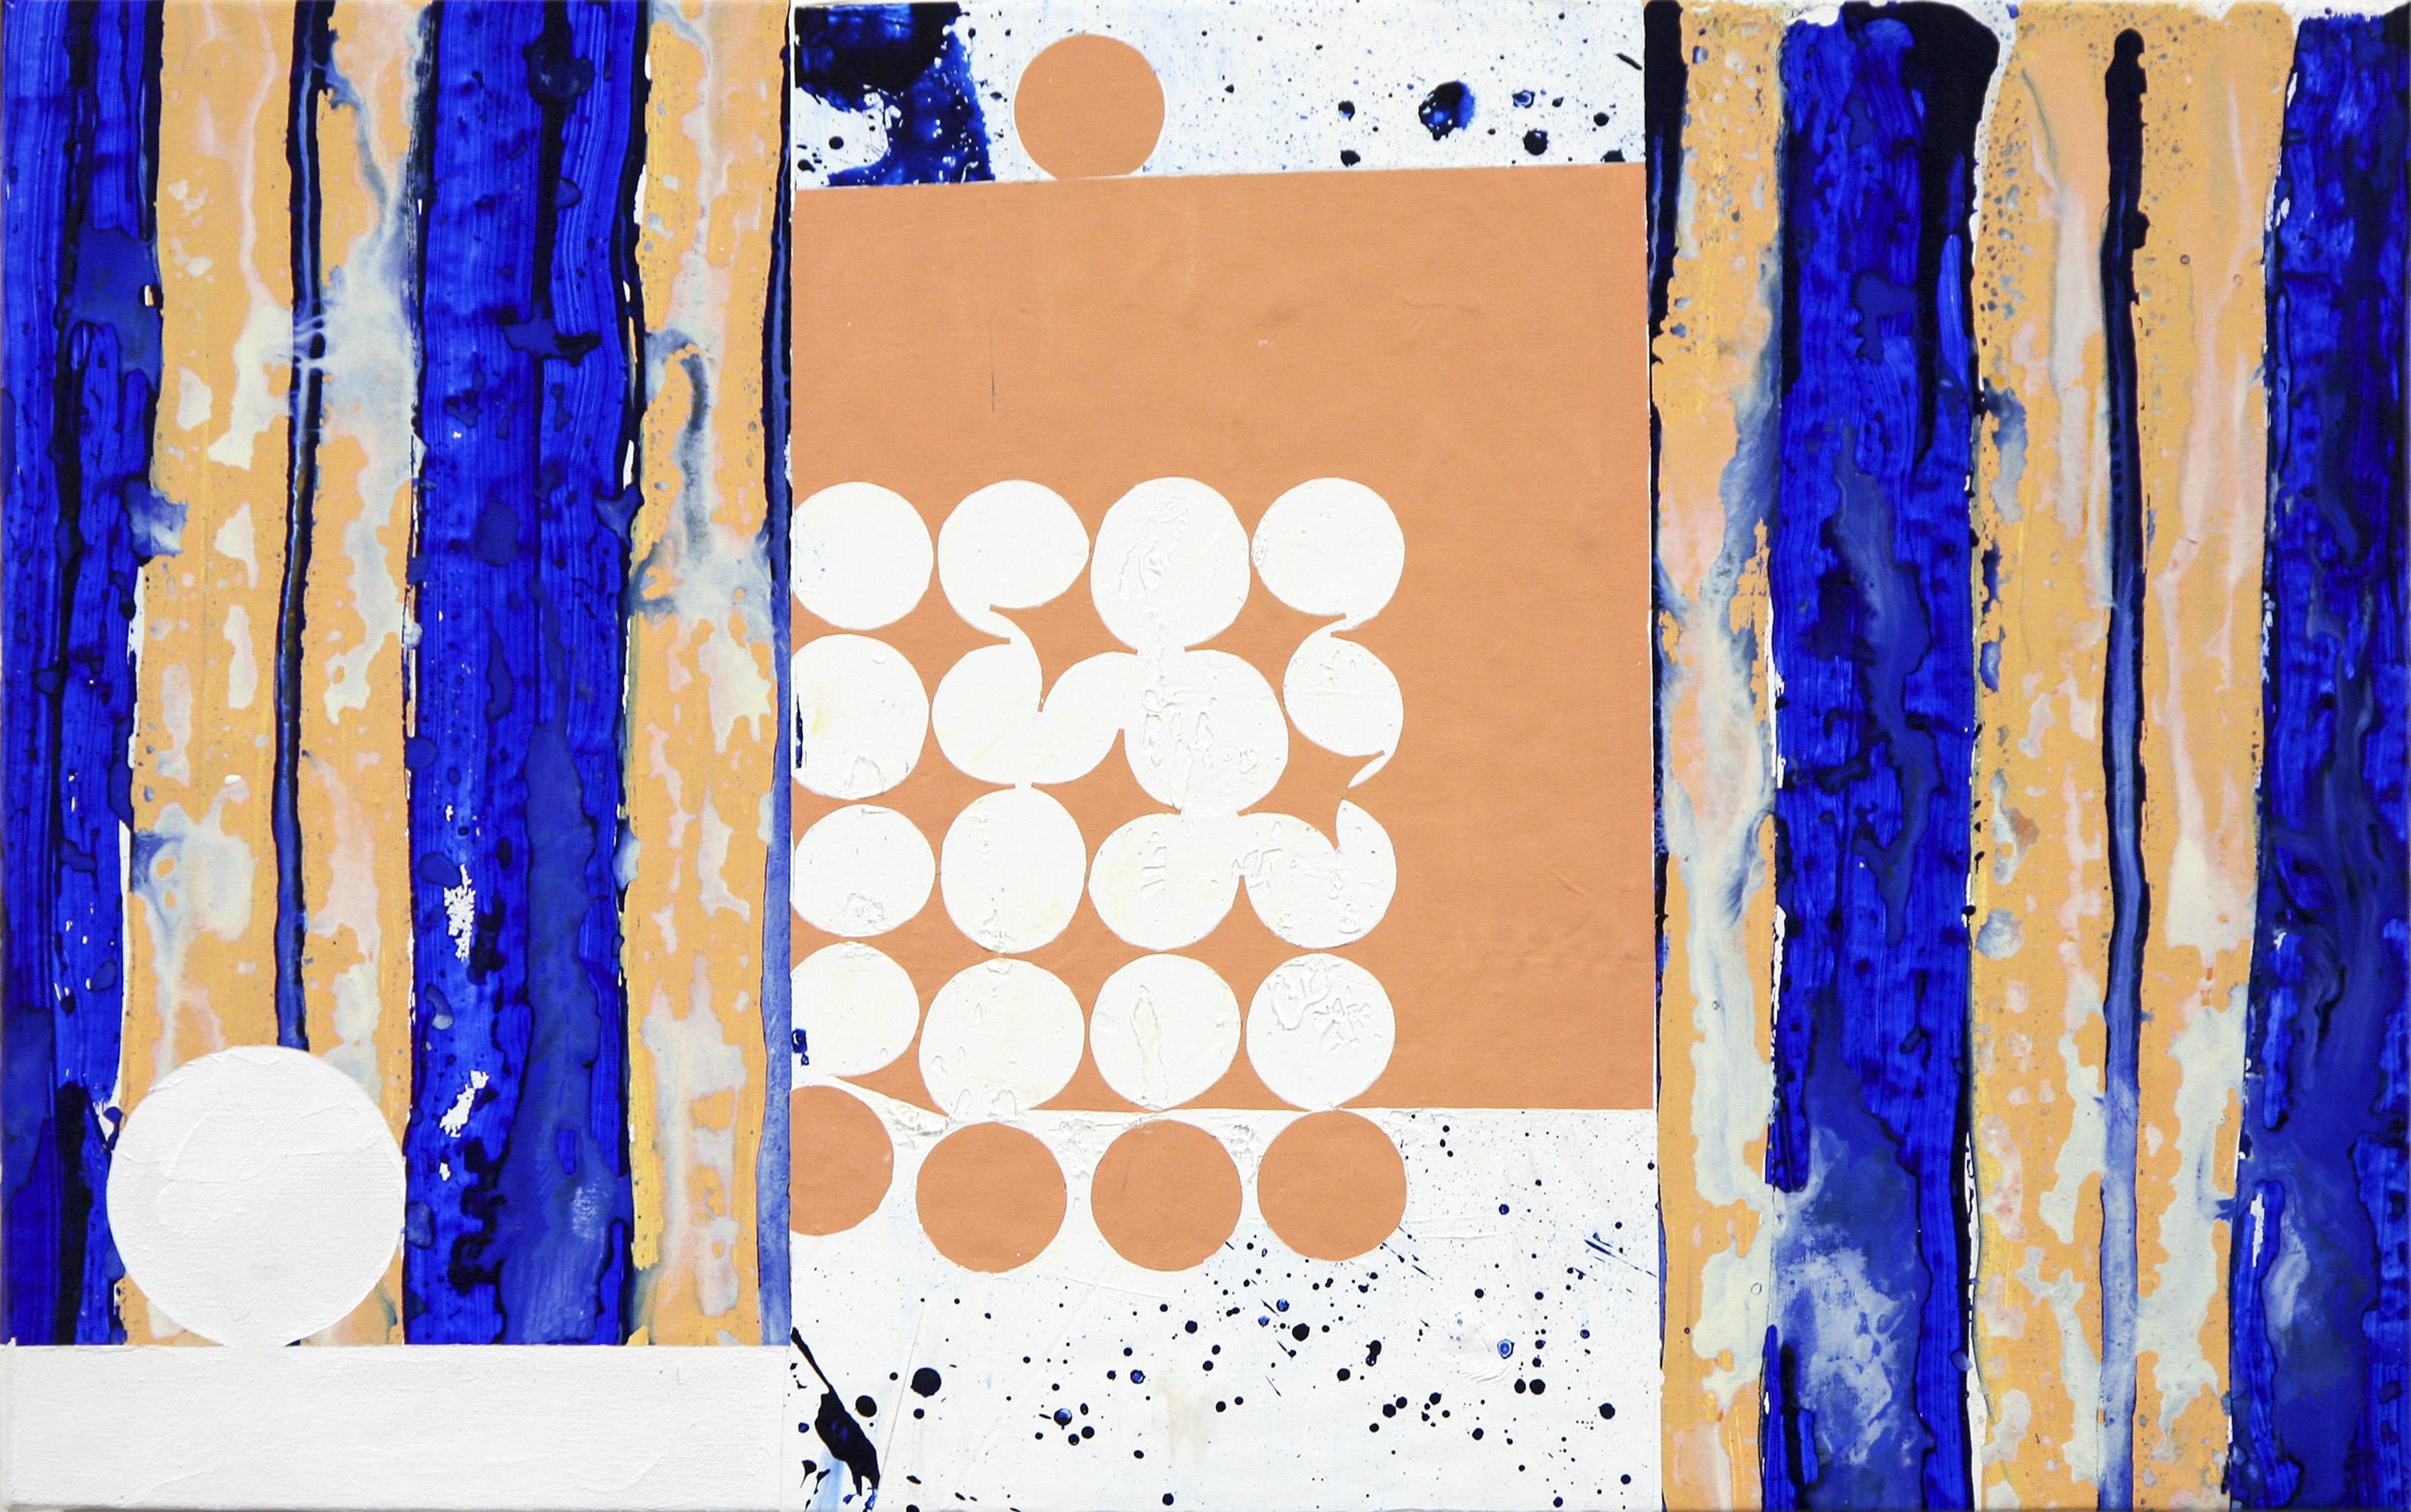 TolbertShane-Untitled1-2017-AcrylicOnCanvas-15x24-HR